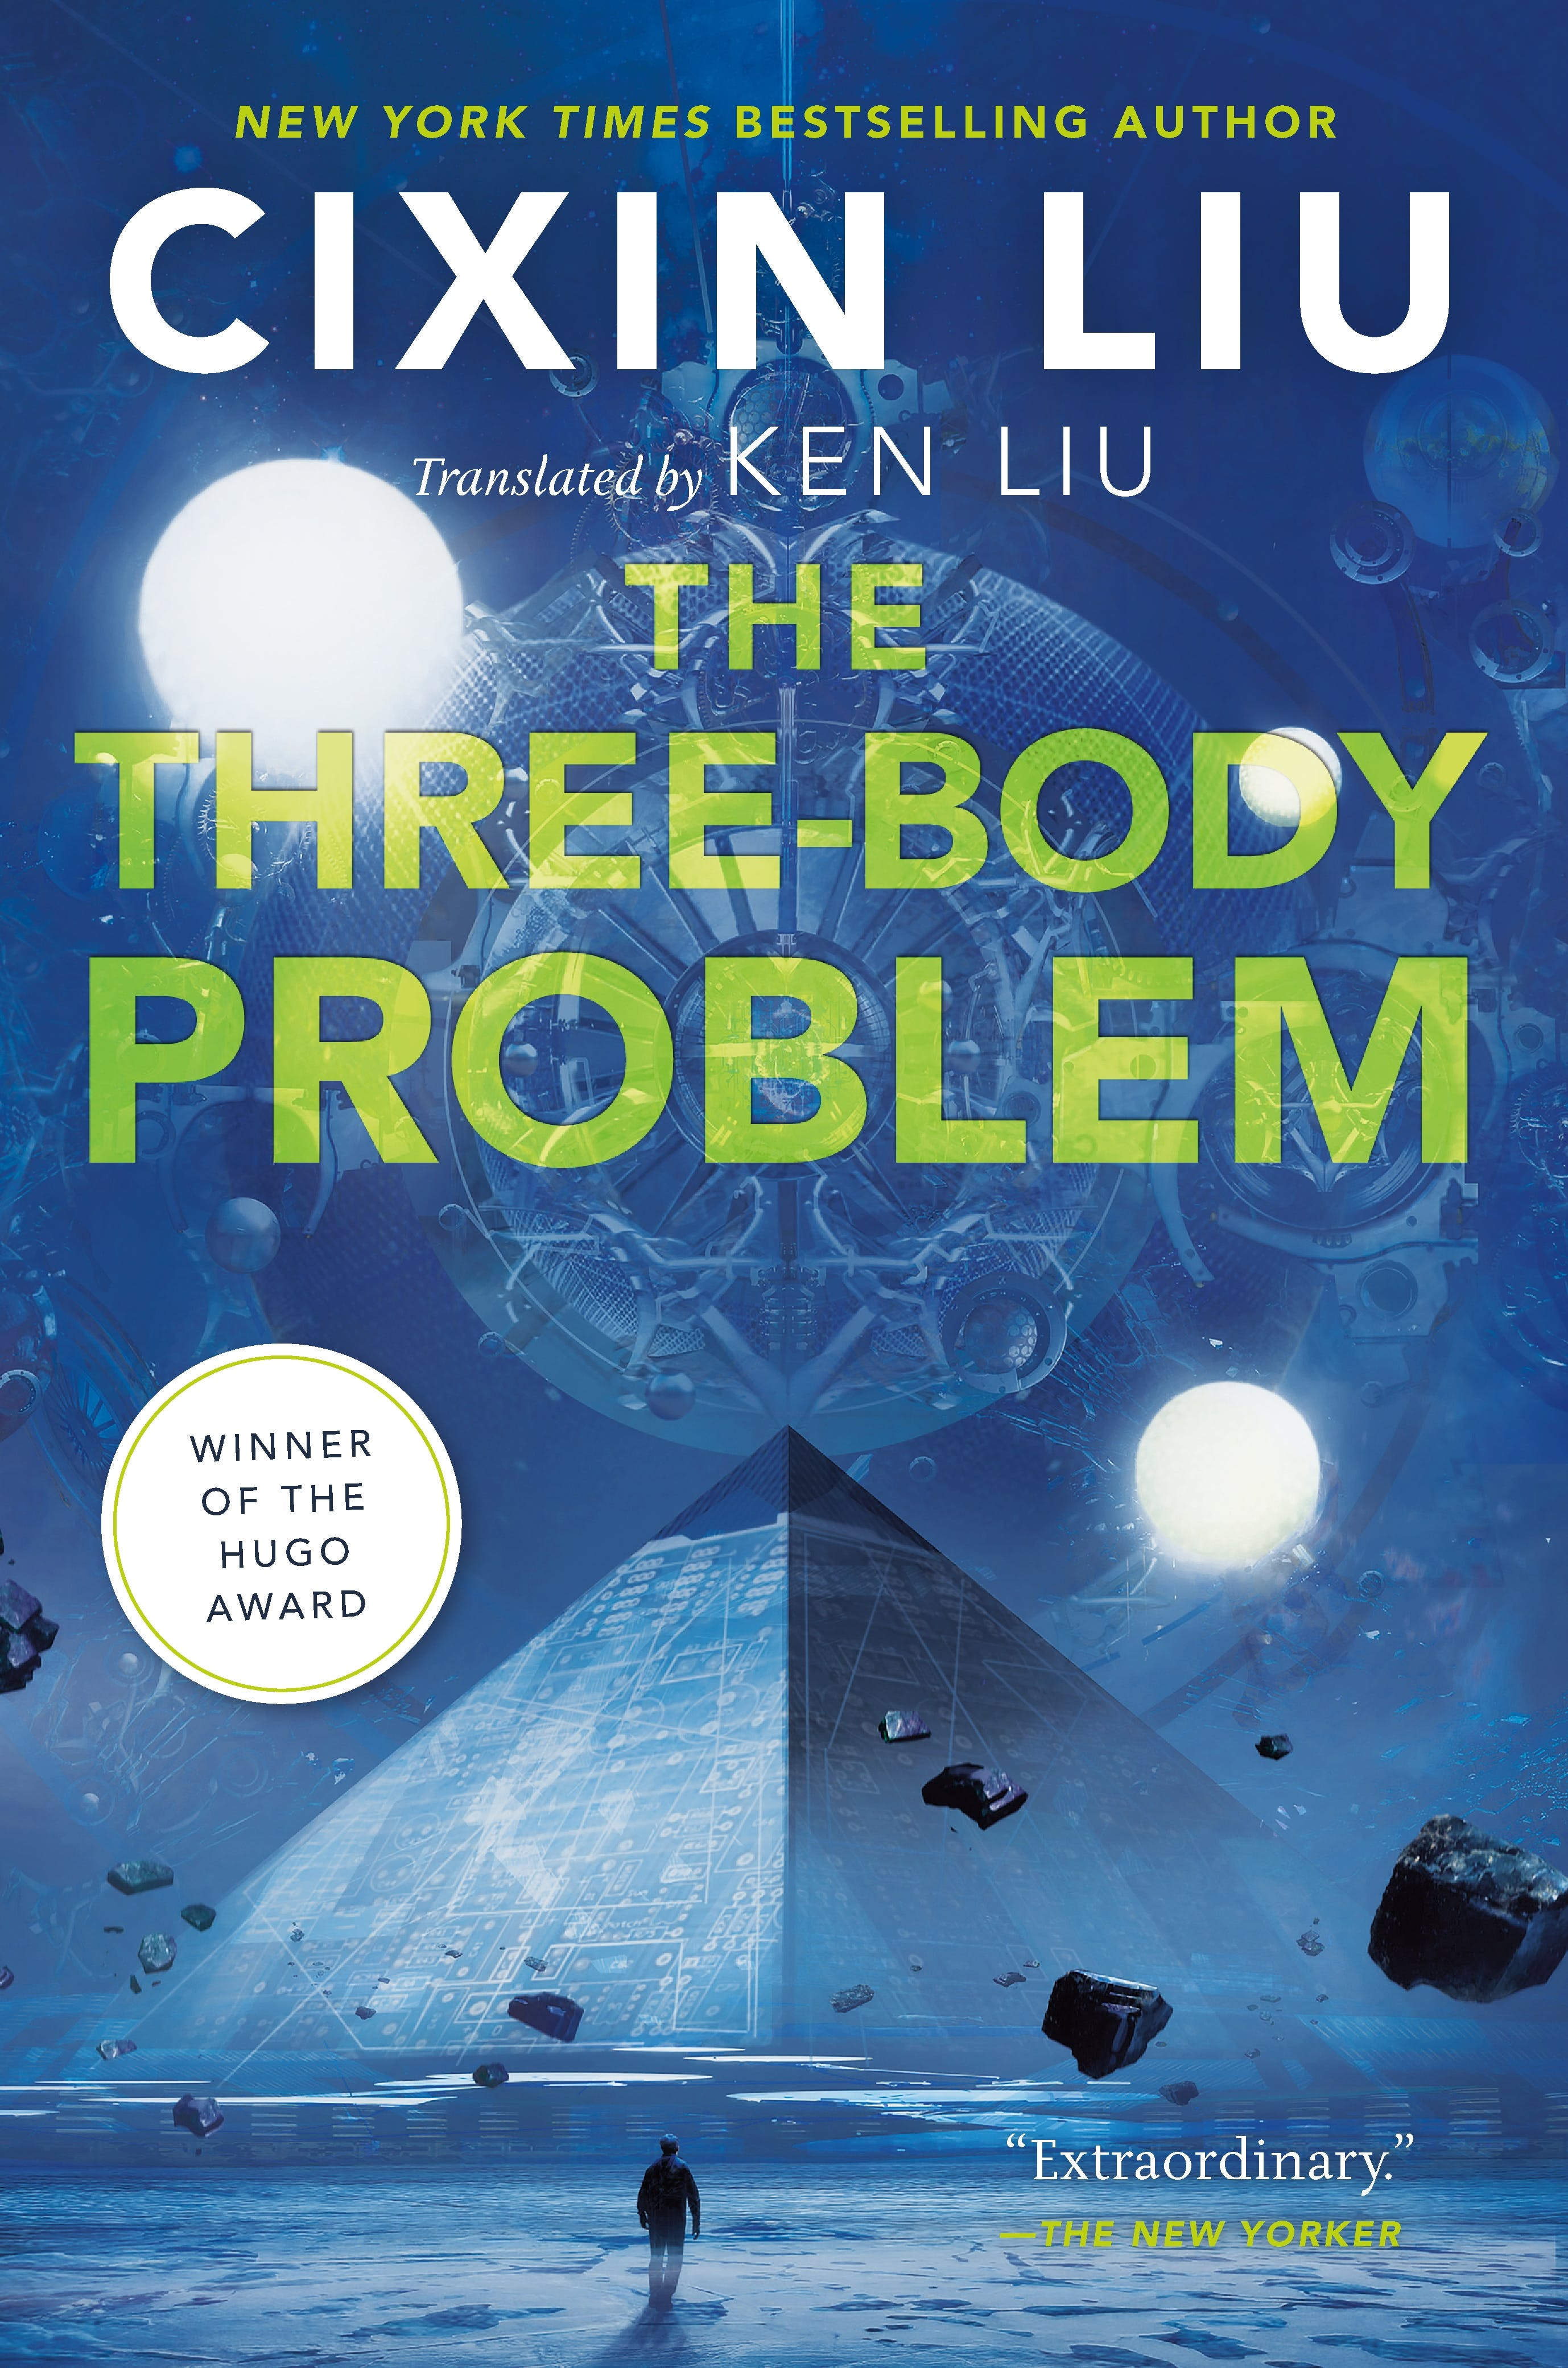 Image of The Three-Body Problem